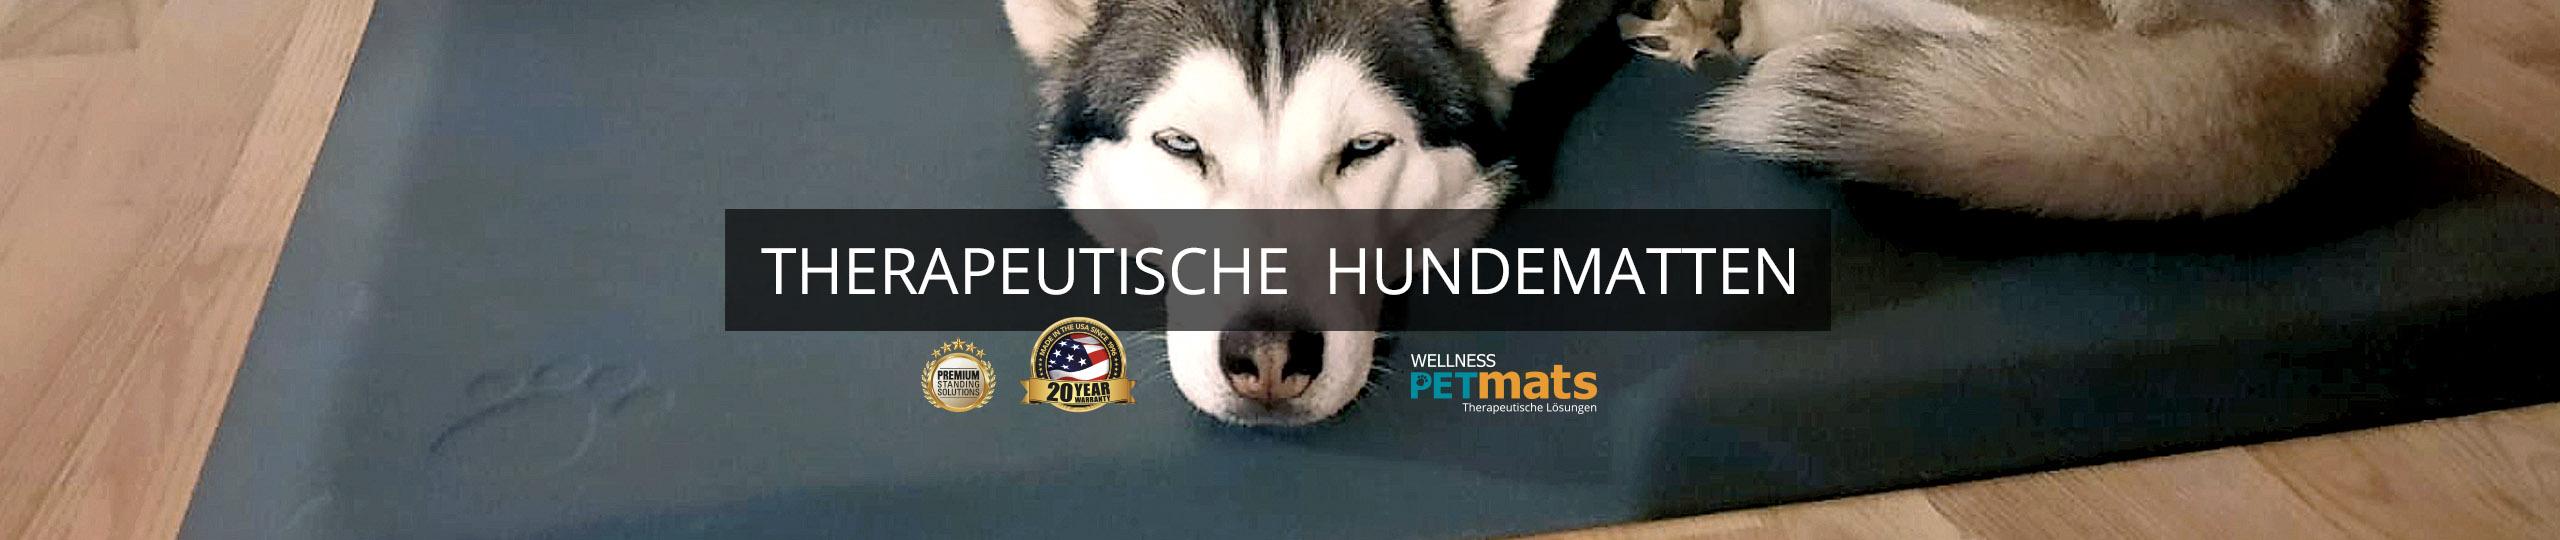 Therapeutische Hundematten